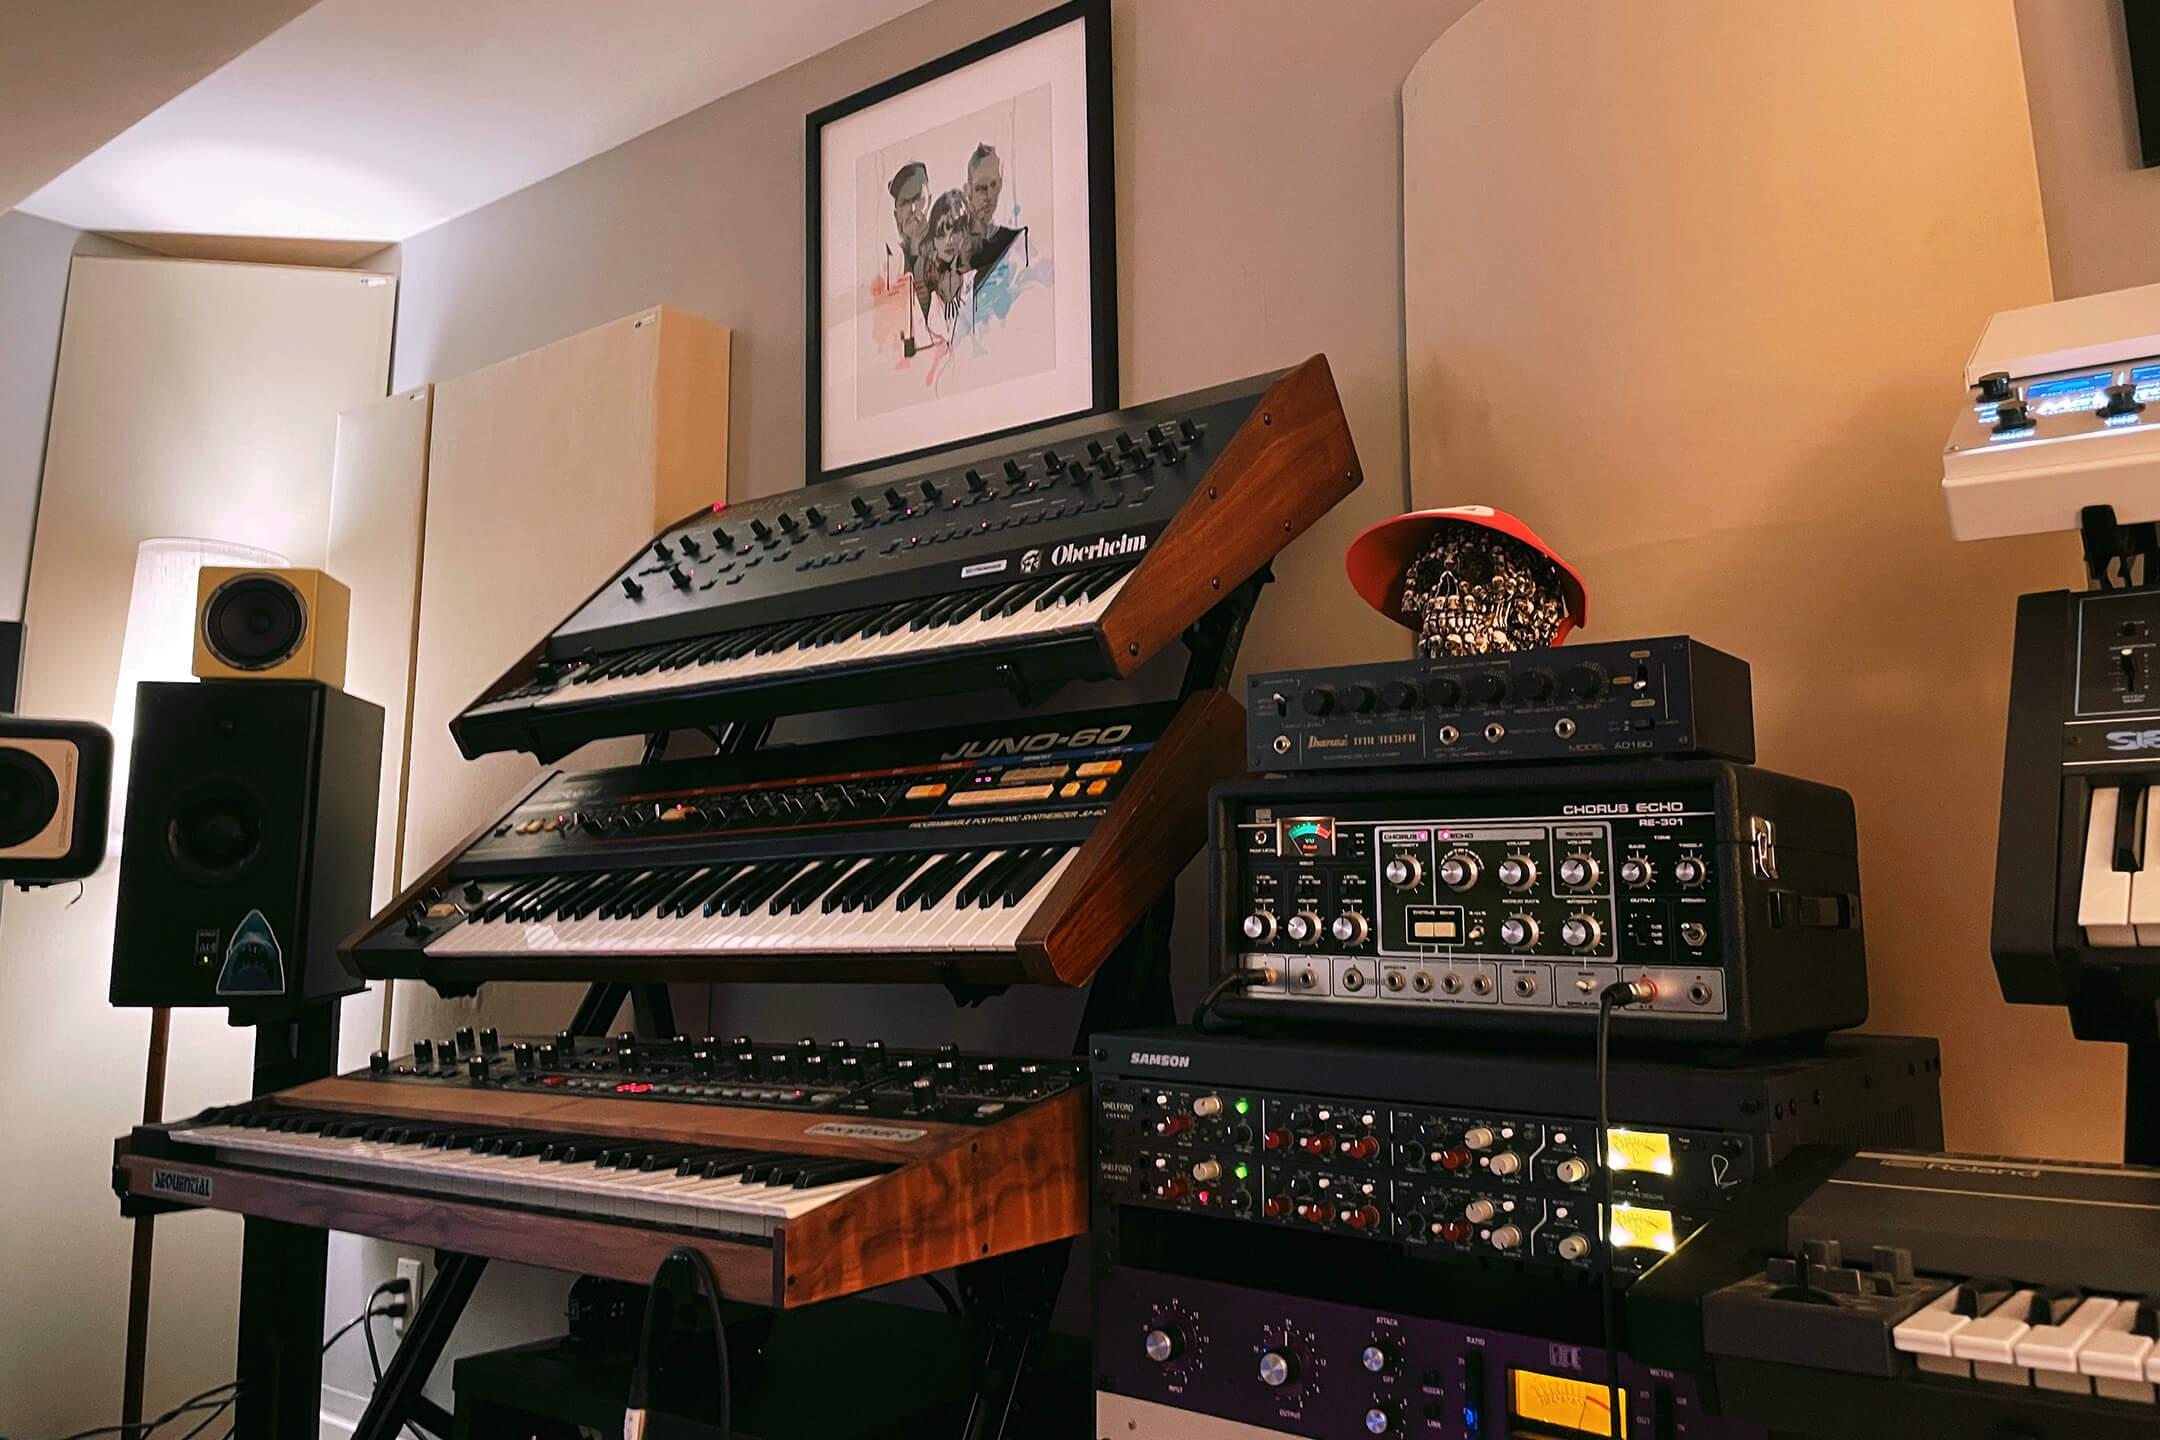 Martin CHVRCHES Studio Juno-60 Prophet 5